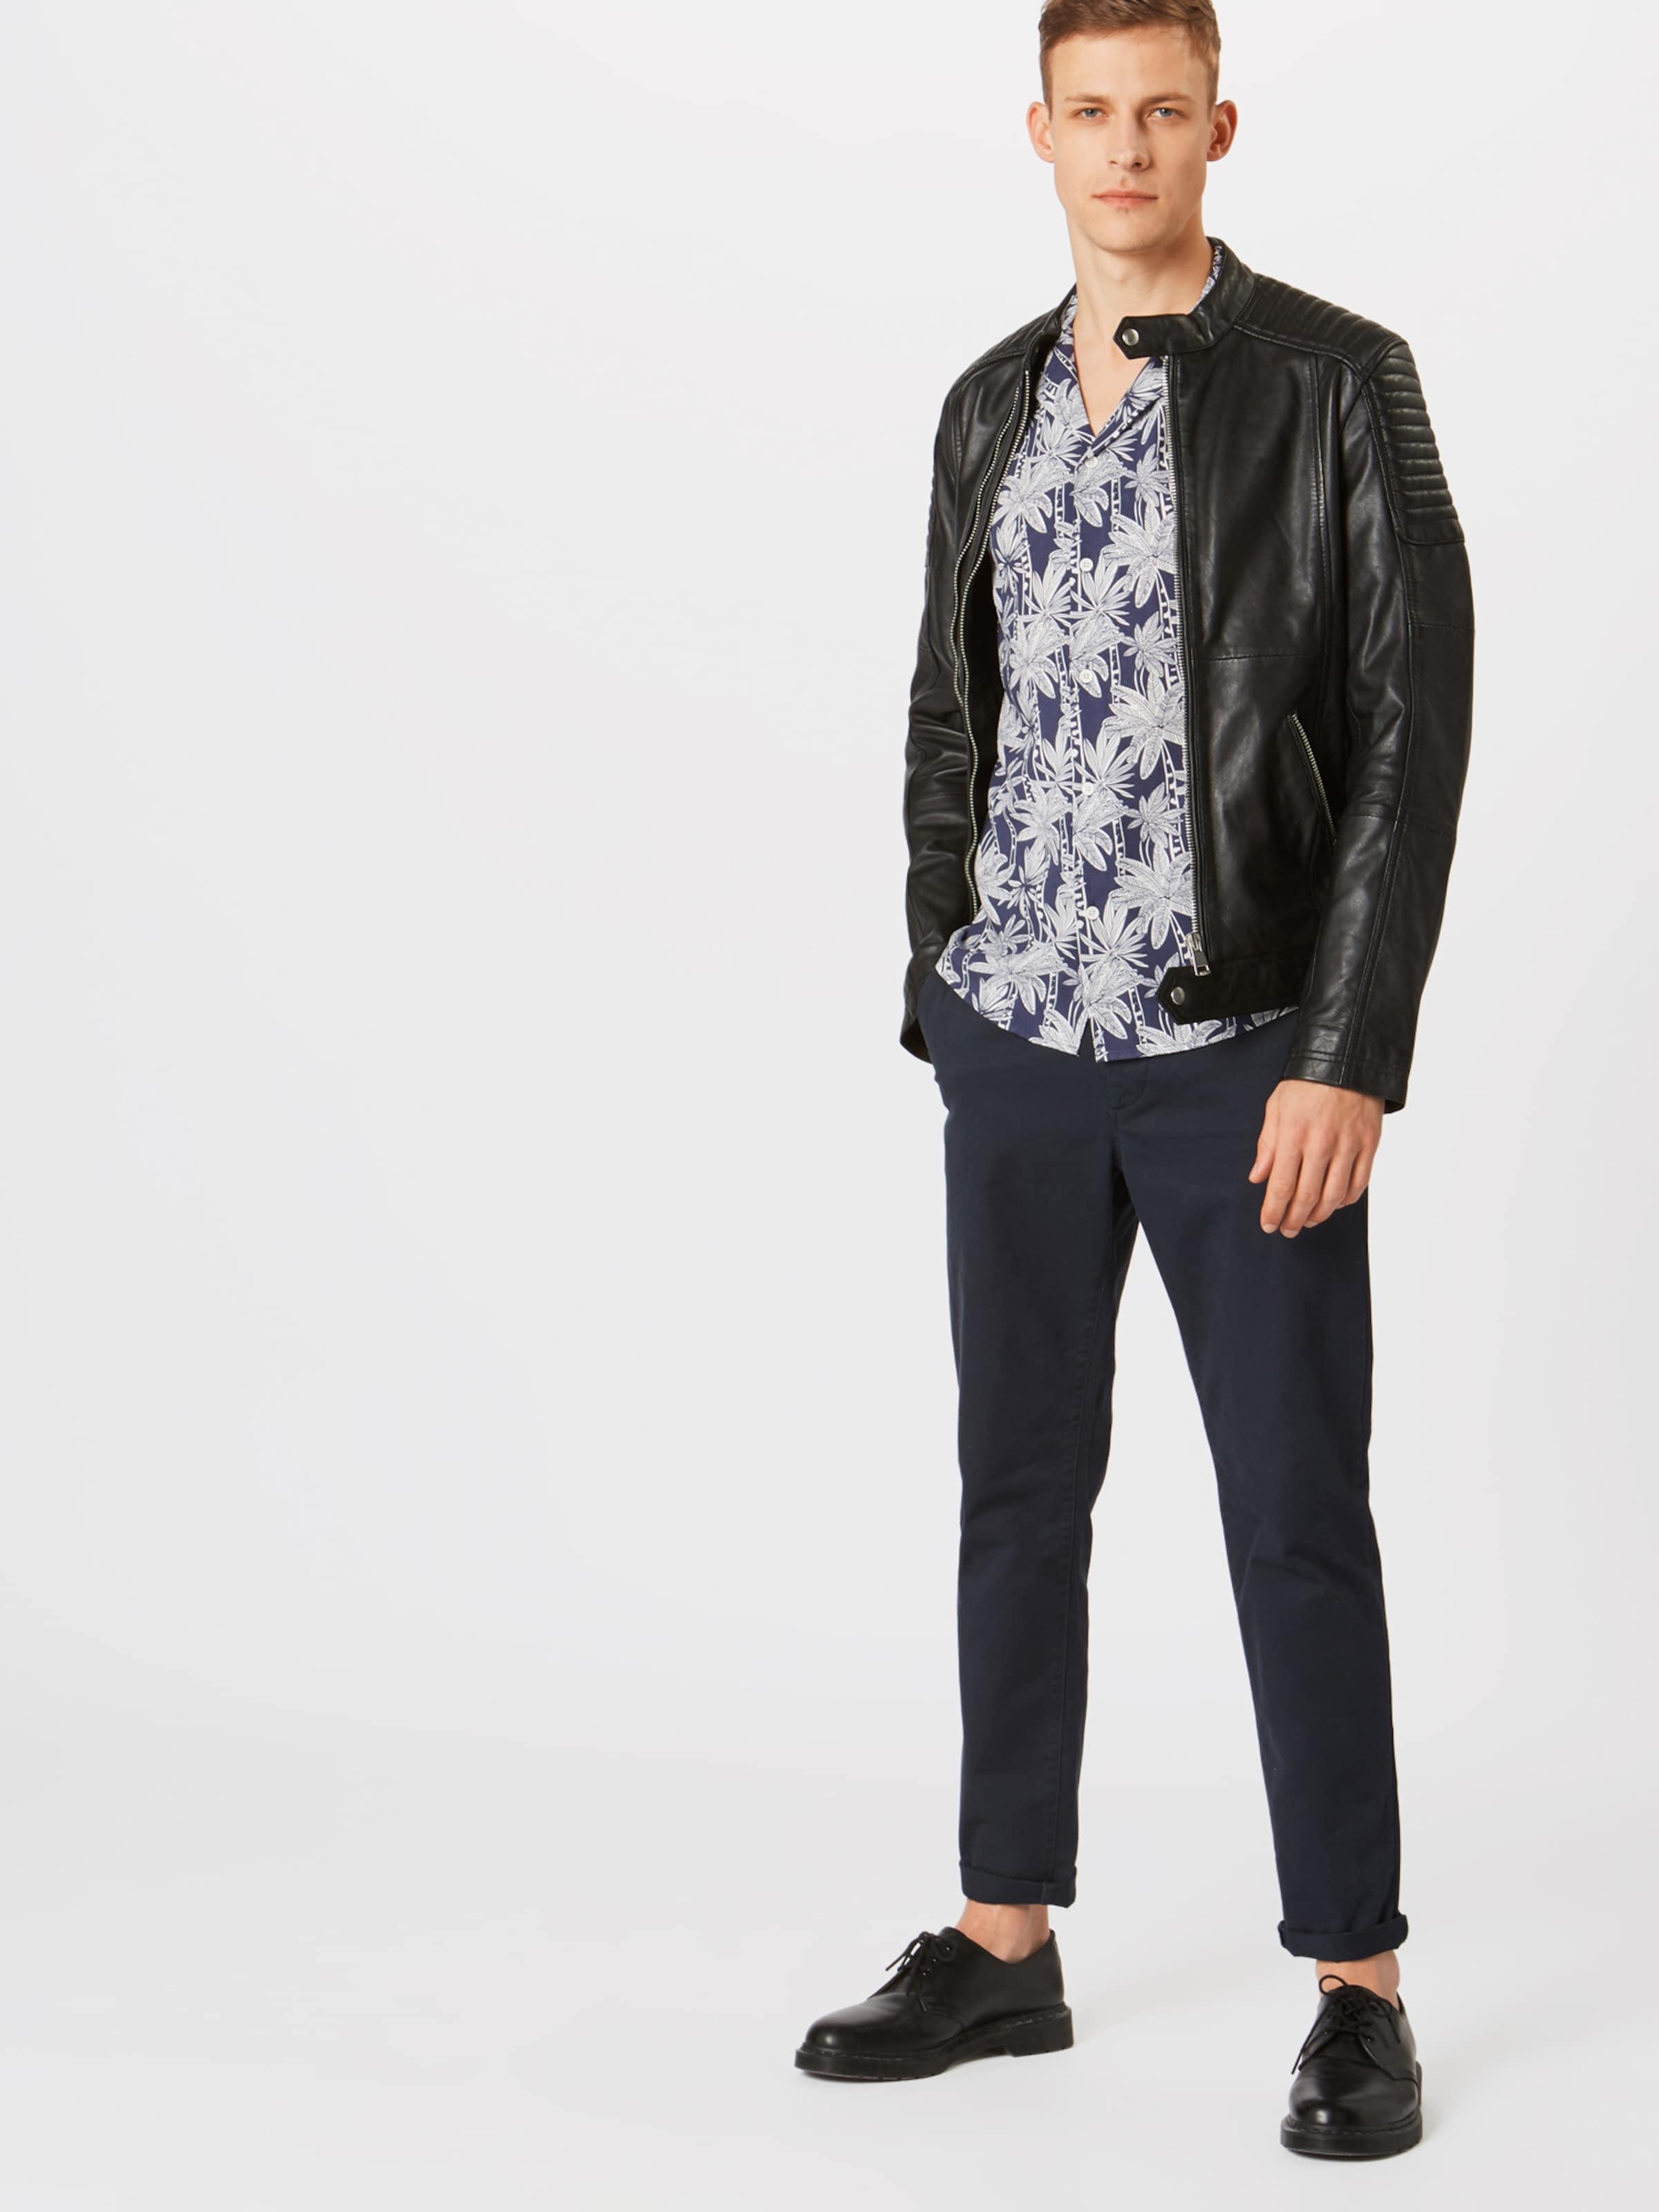 Tropic HimmelblauWeiß solid In 'shirtBrando Ss' Hemd YgyvIfb76